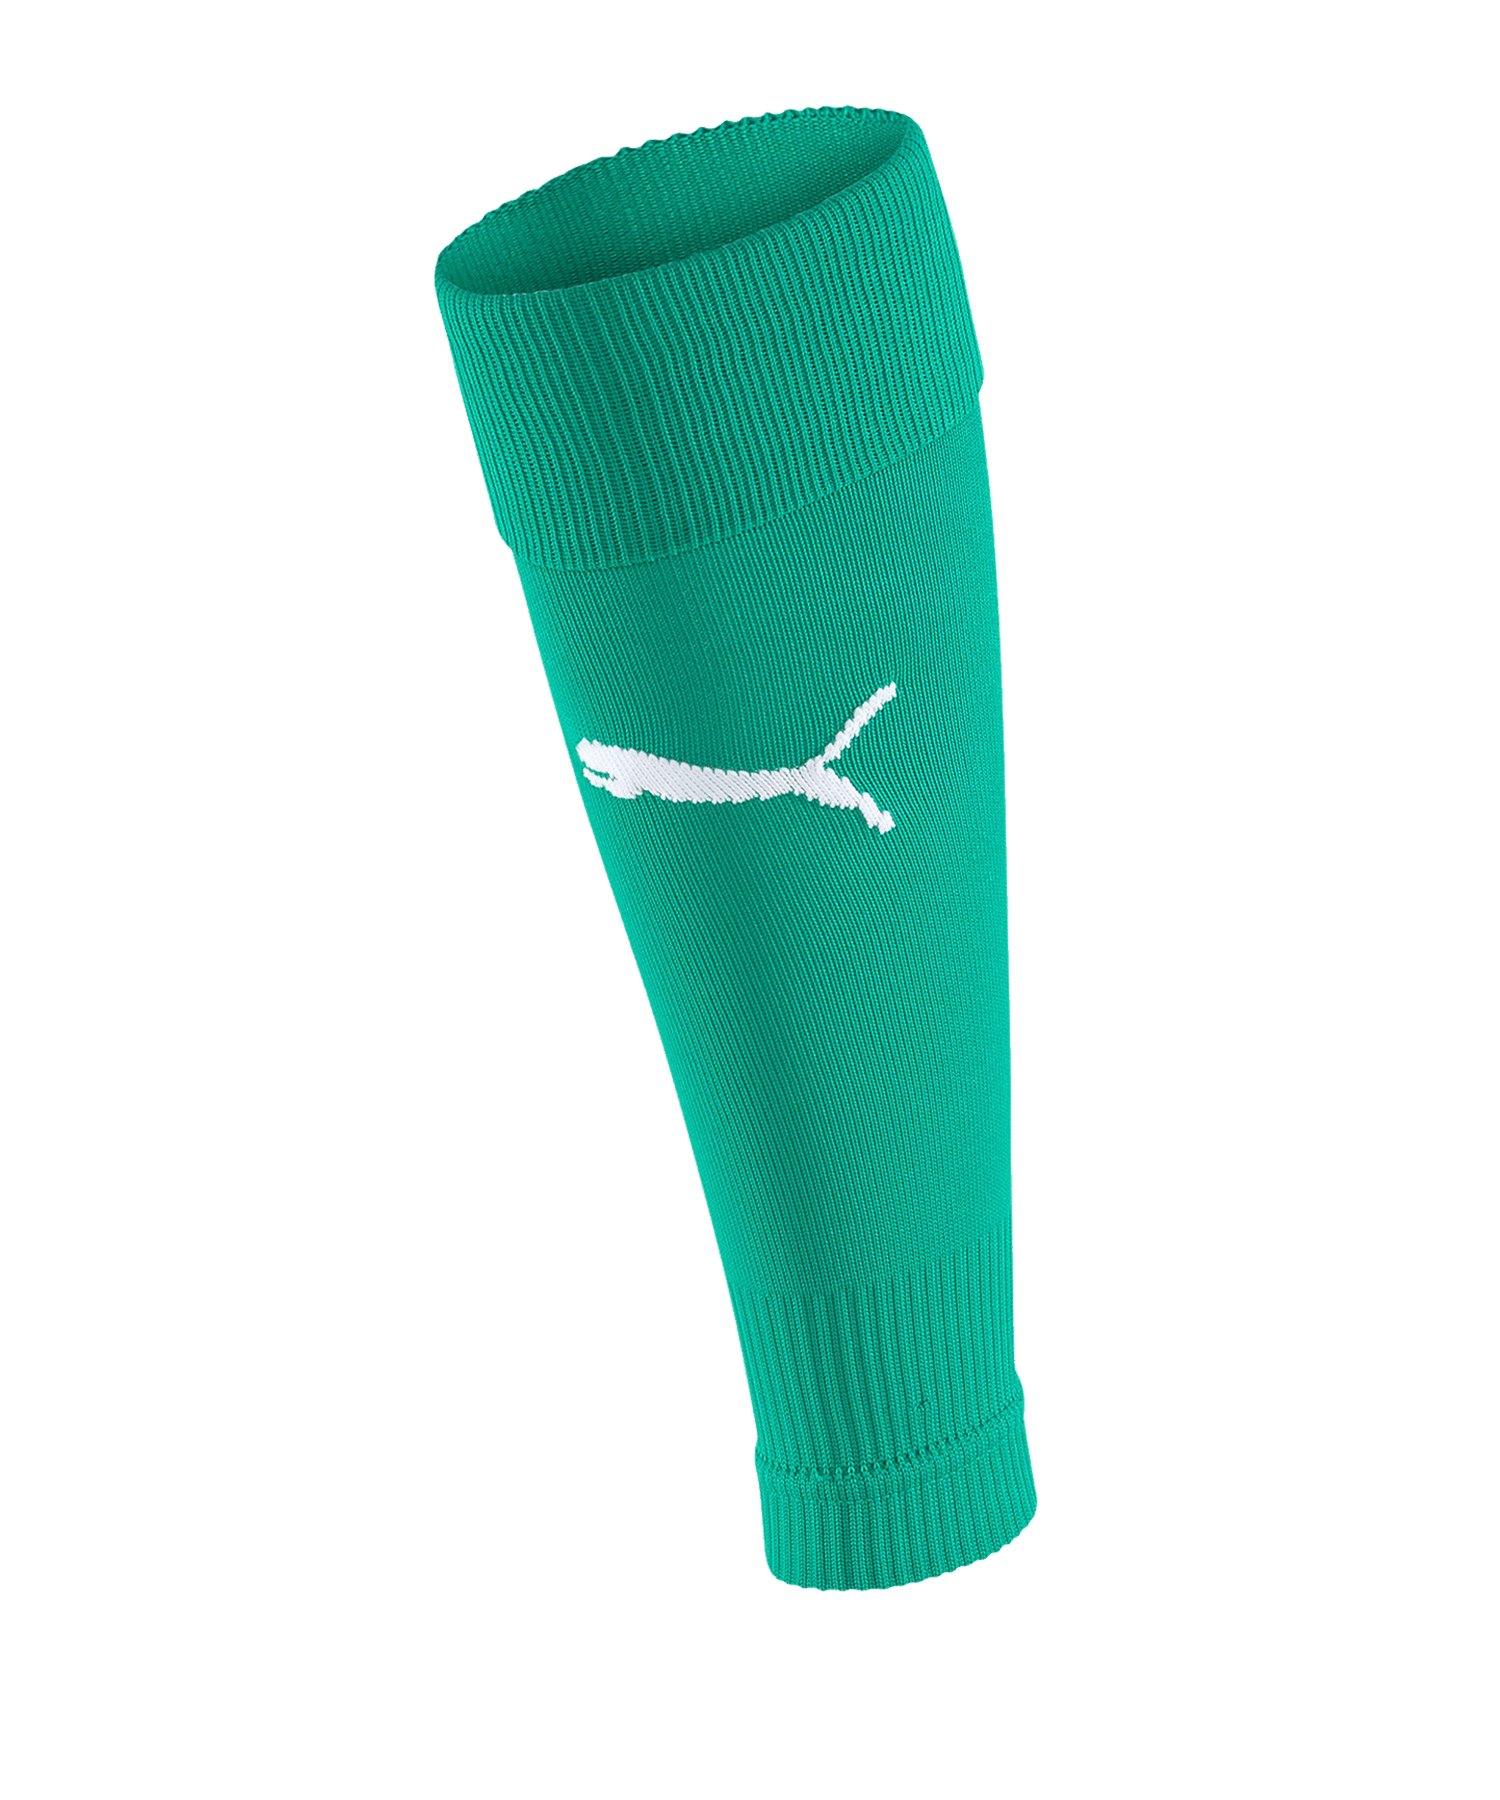 PUMA teamGOAL 23 Sleeve Socks Grün F05 - Gruen